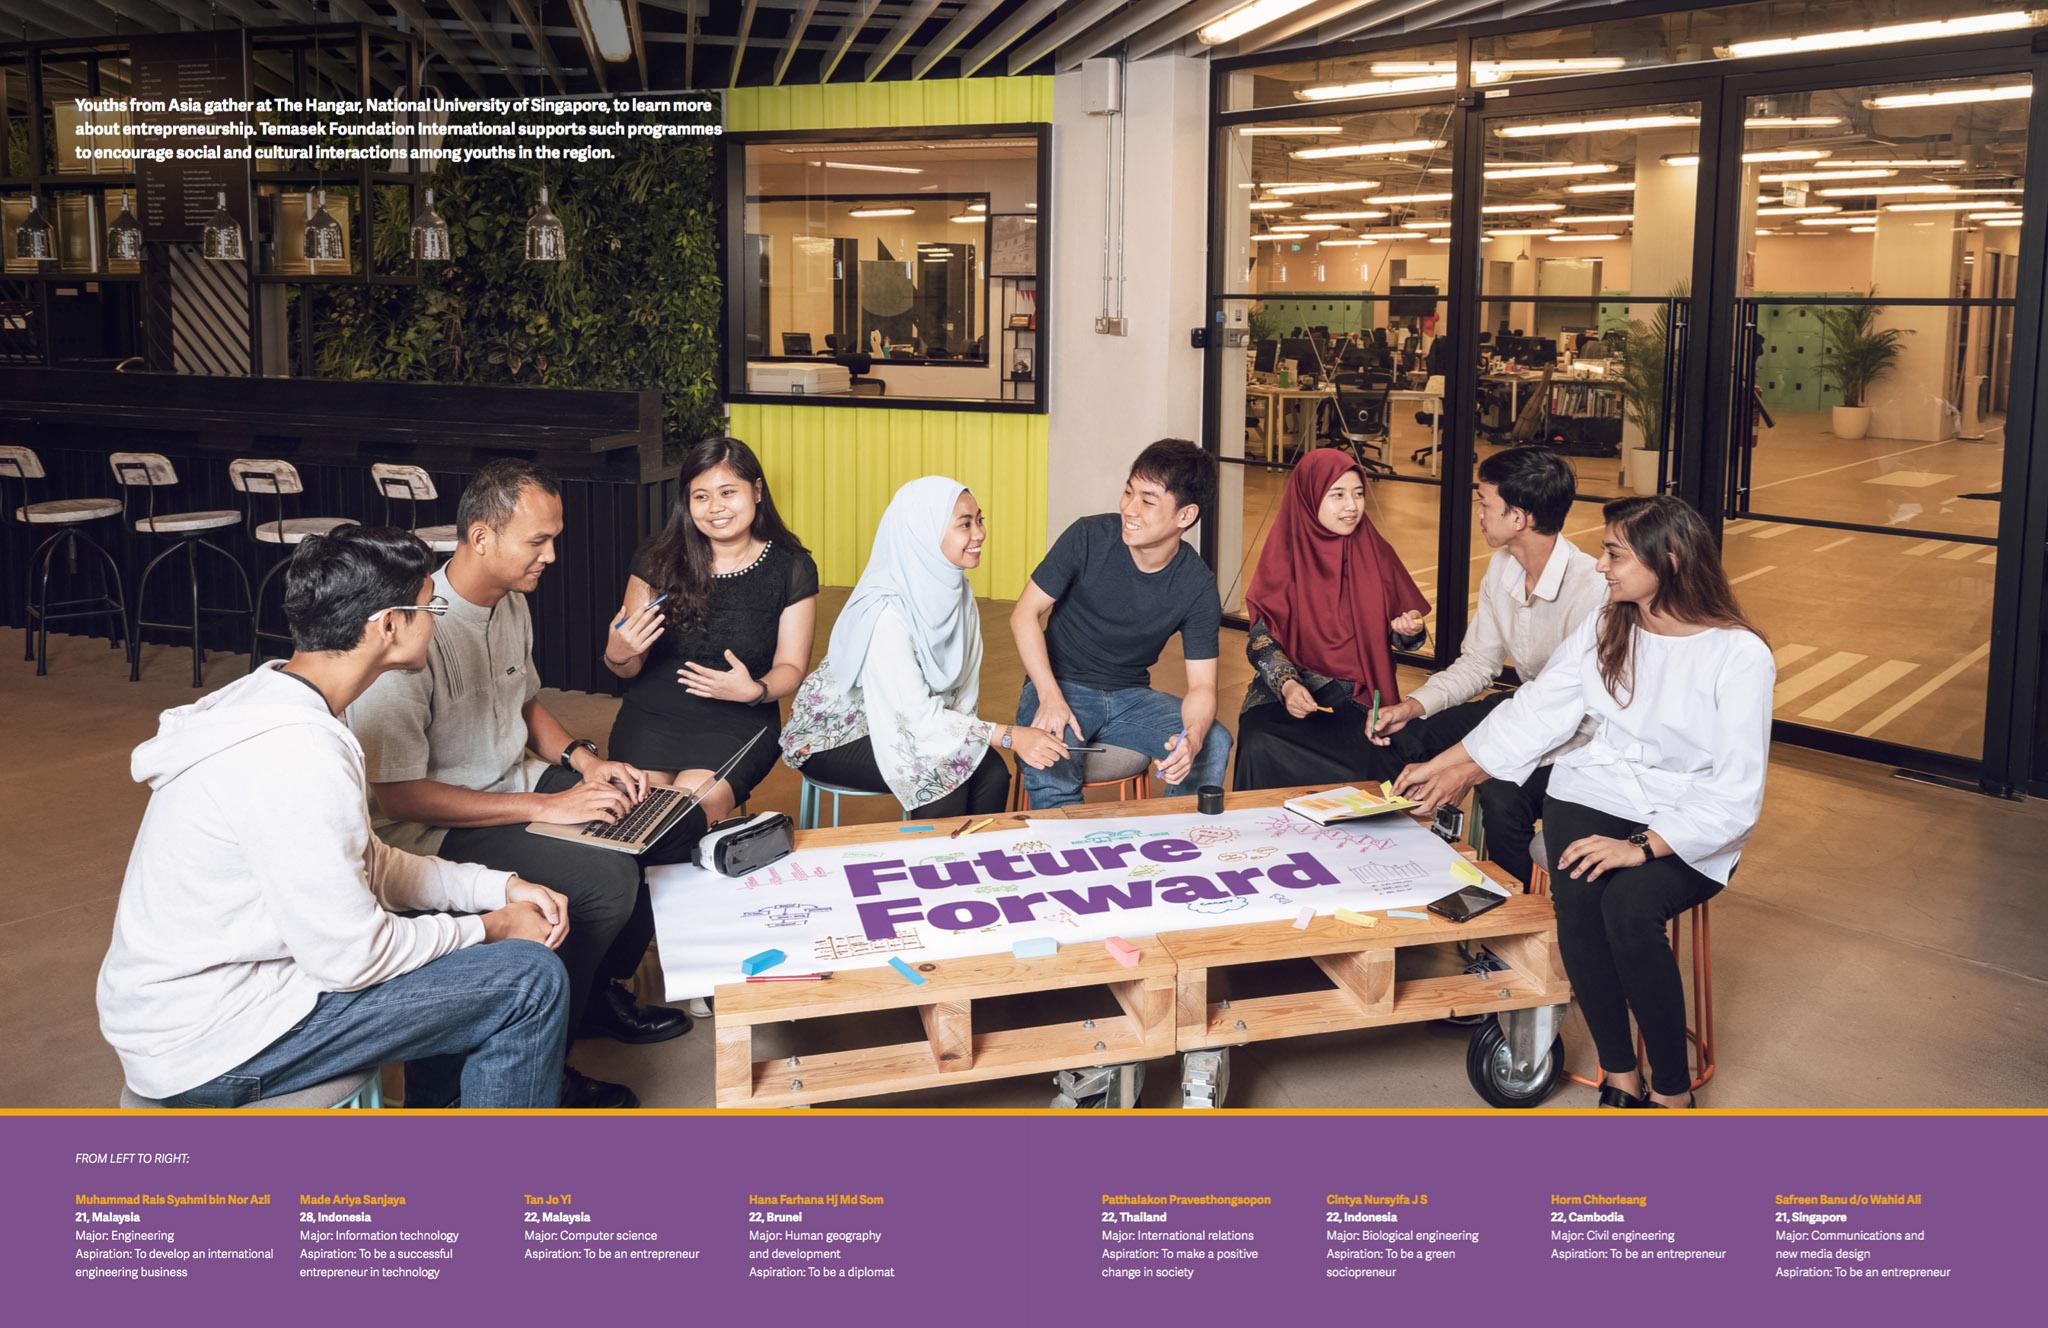 002-002TFI-AR-2018-Inside-singapore-photographer-editorial-commercial-2.jpg